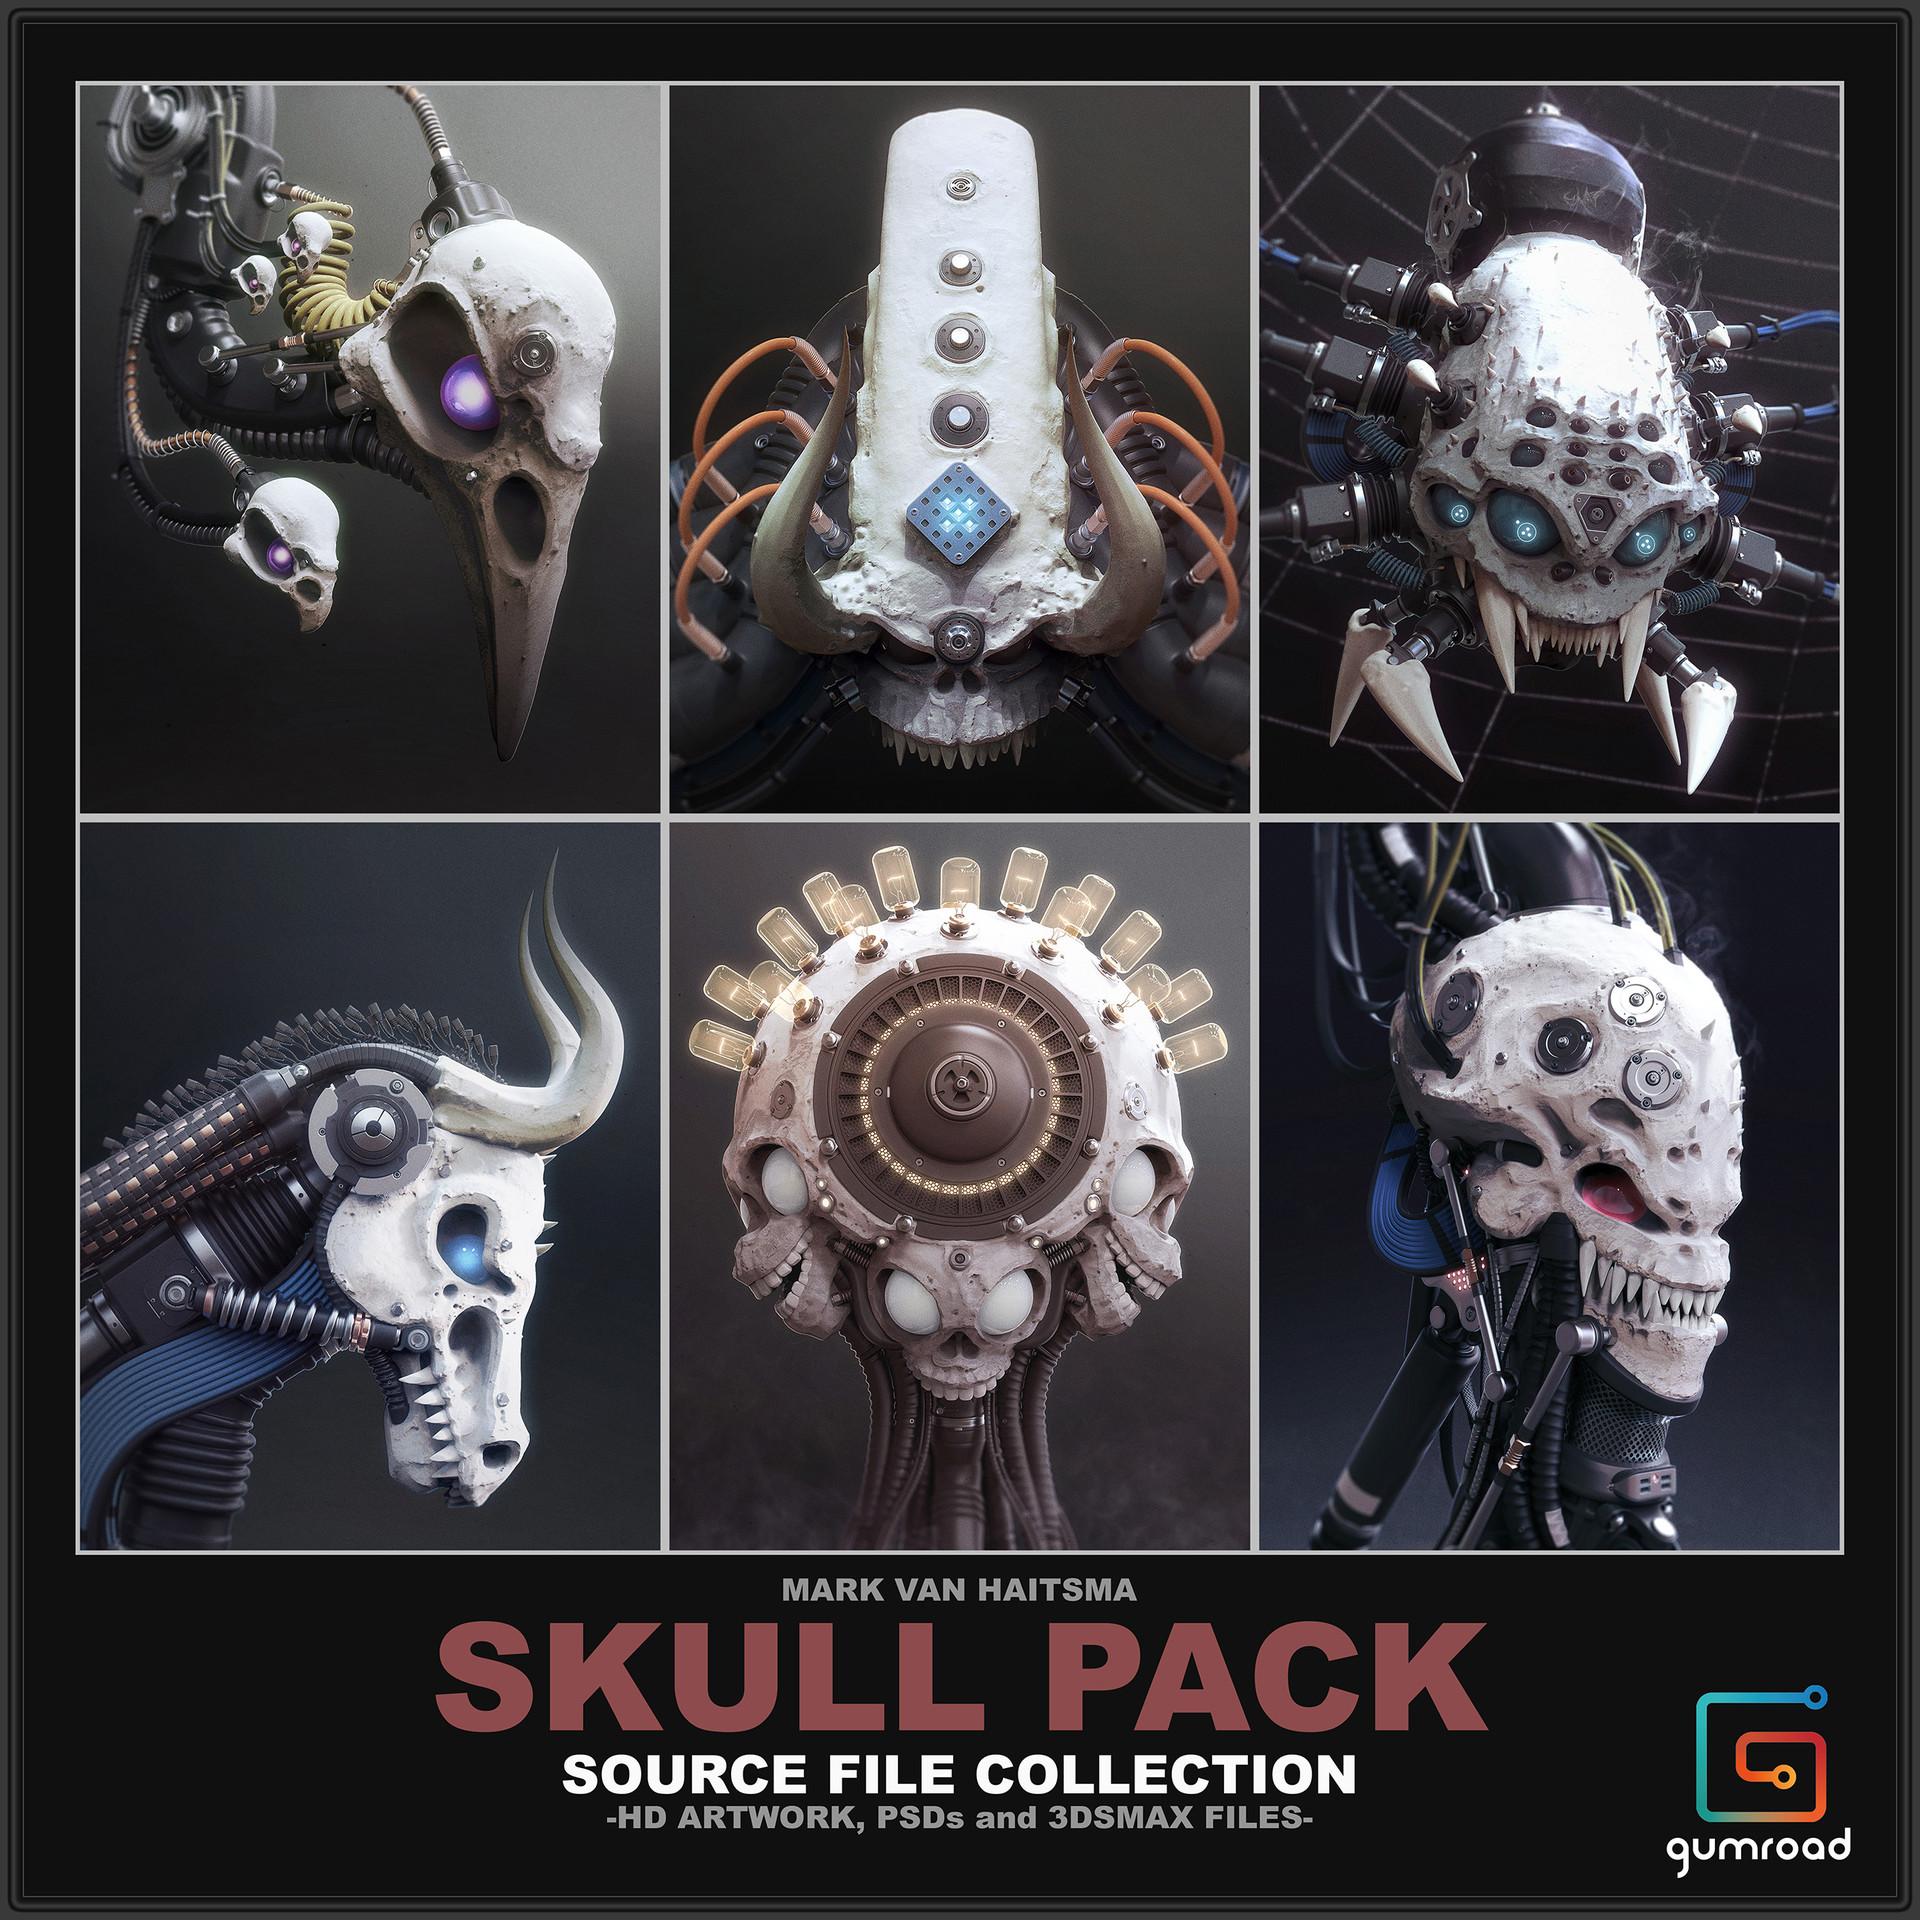 Mark van haitsma skull ad 01 sm